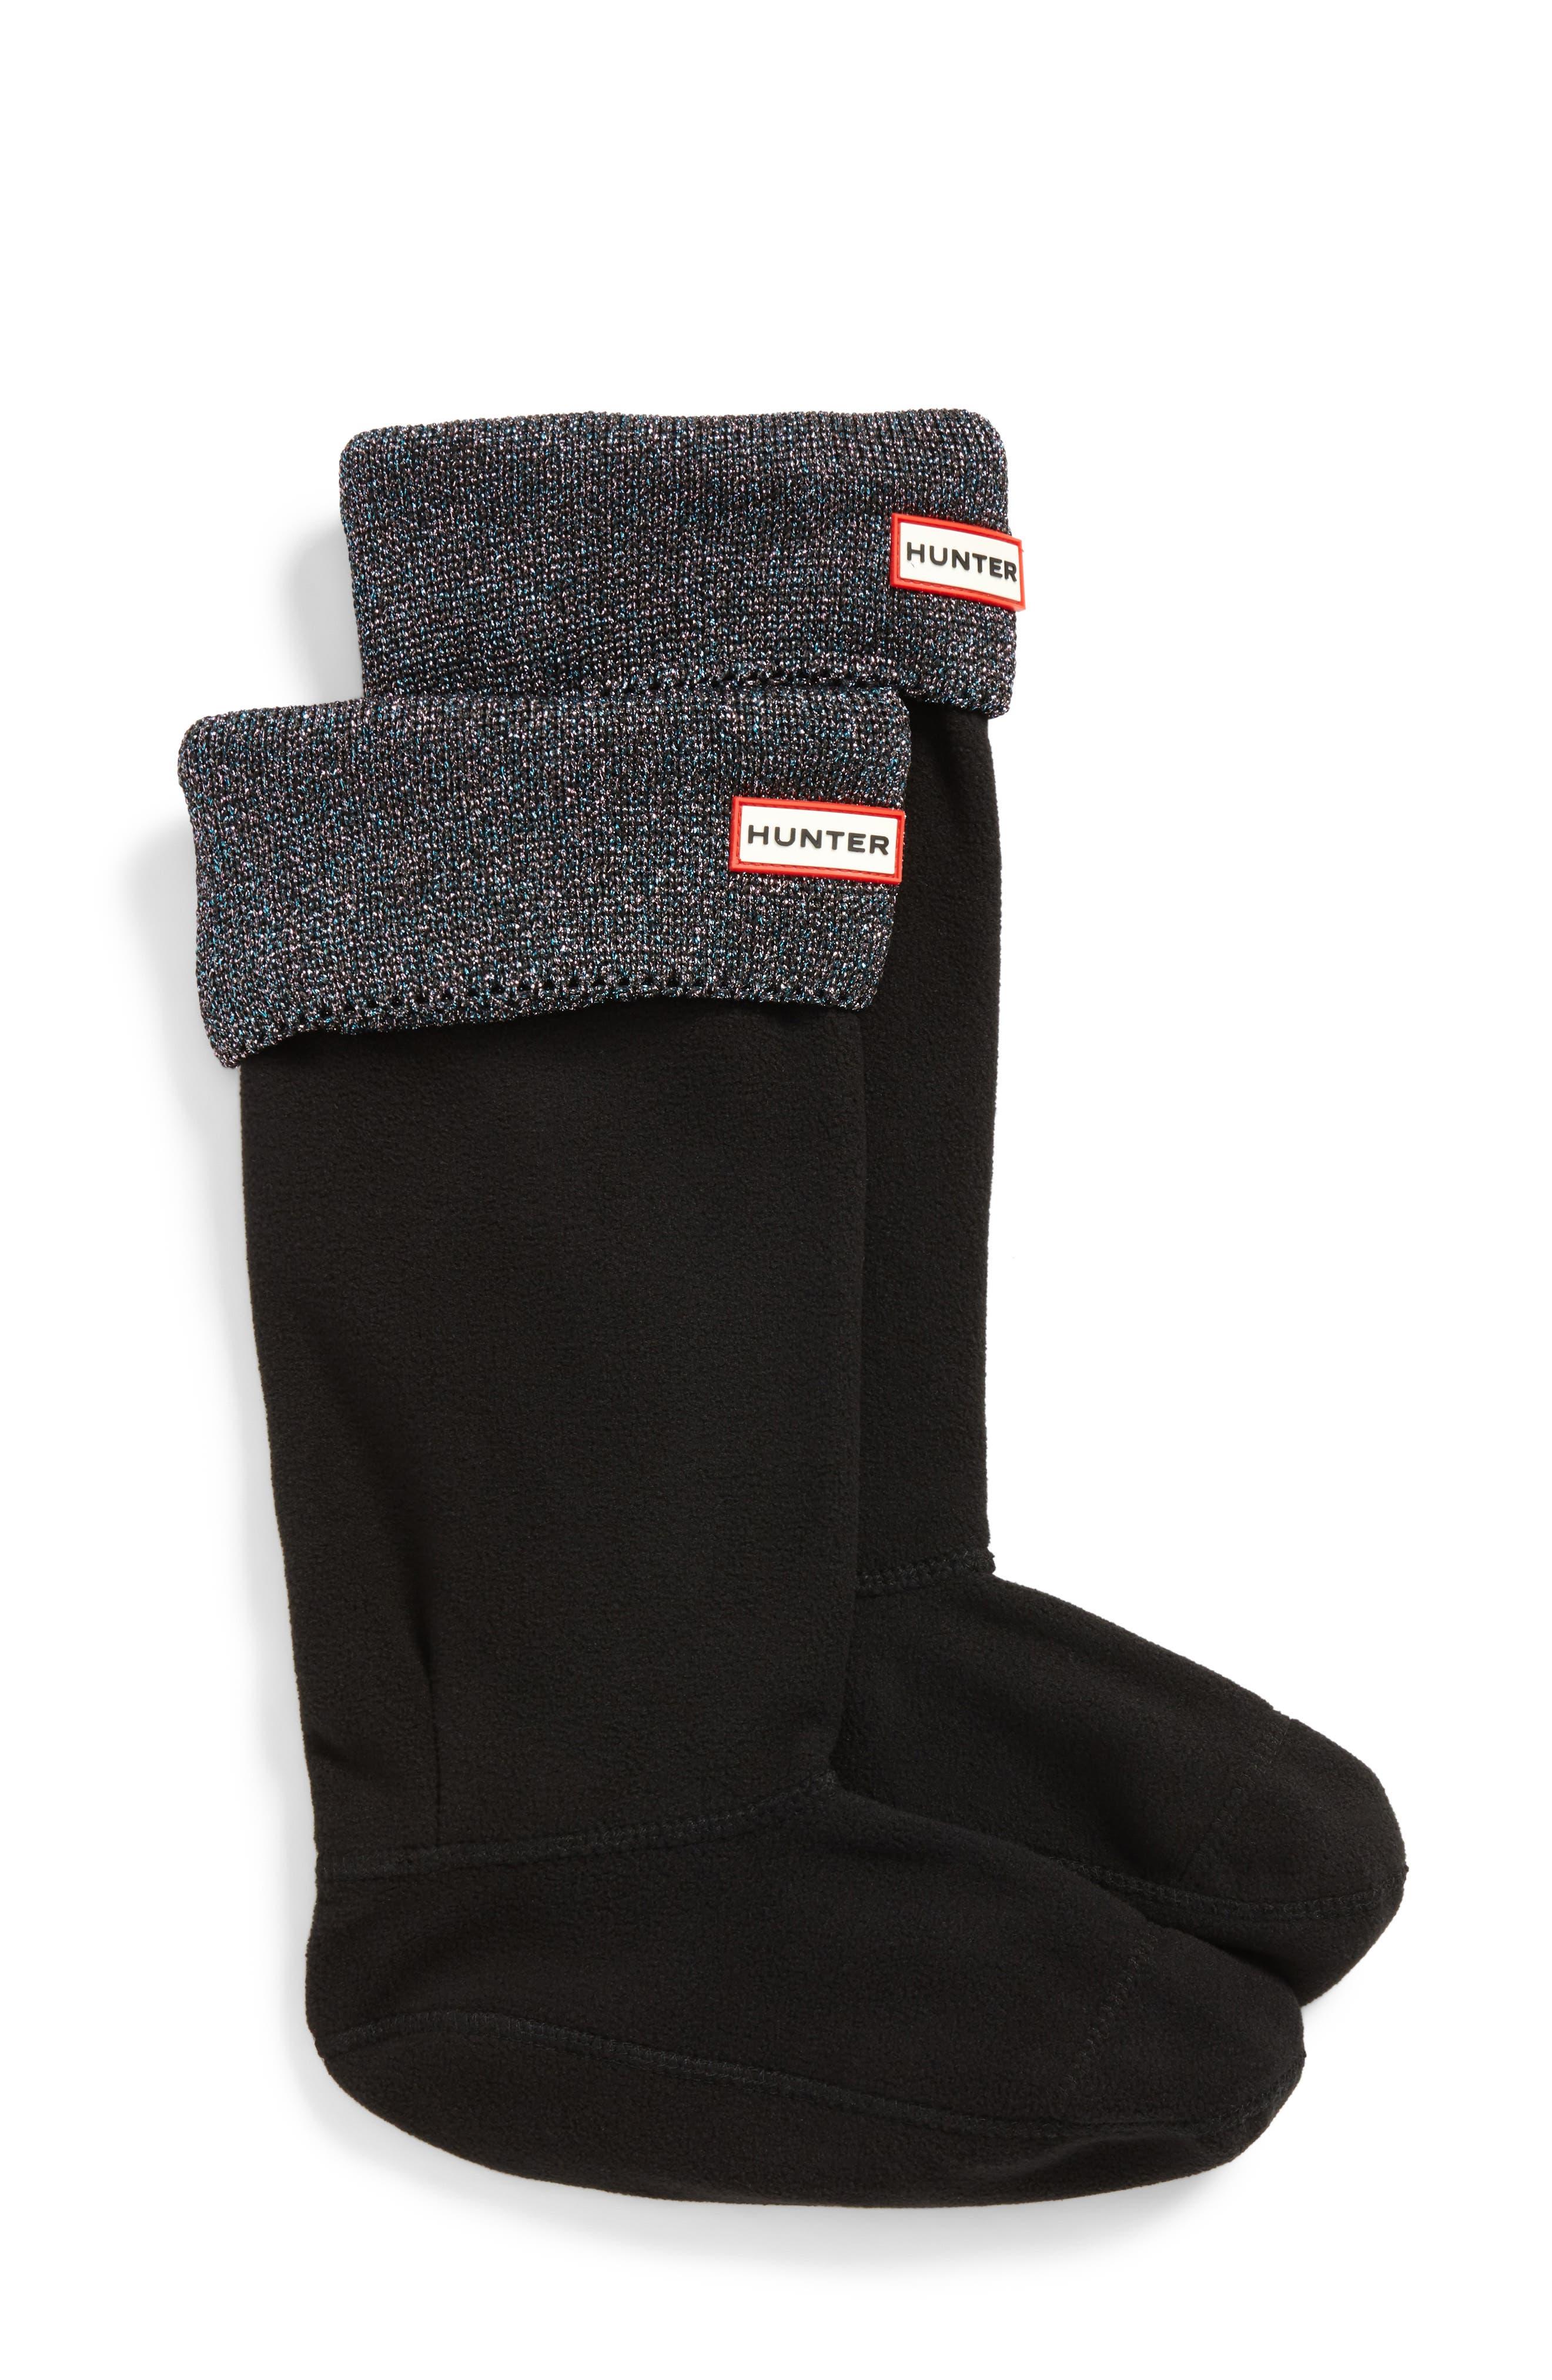 Original Tall Glitter Cuff Welly Boot Socks,                         Main,                         color, Black Multi